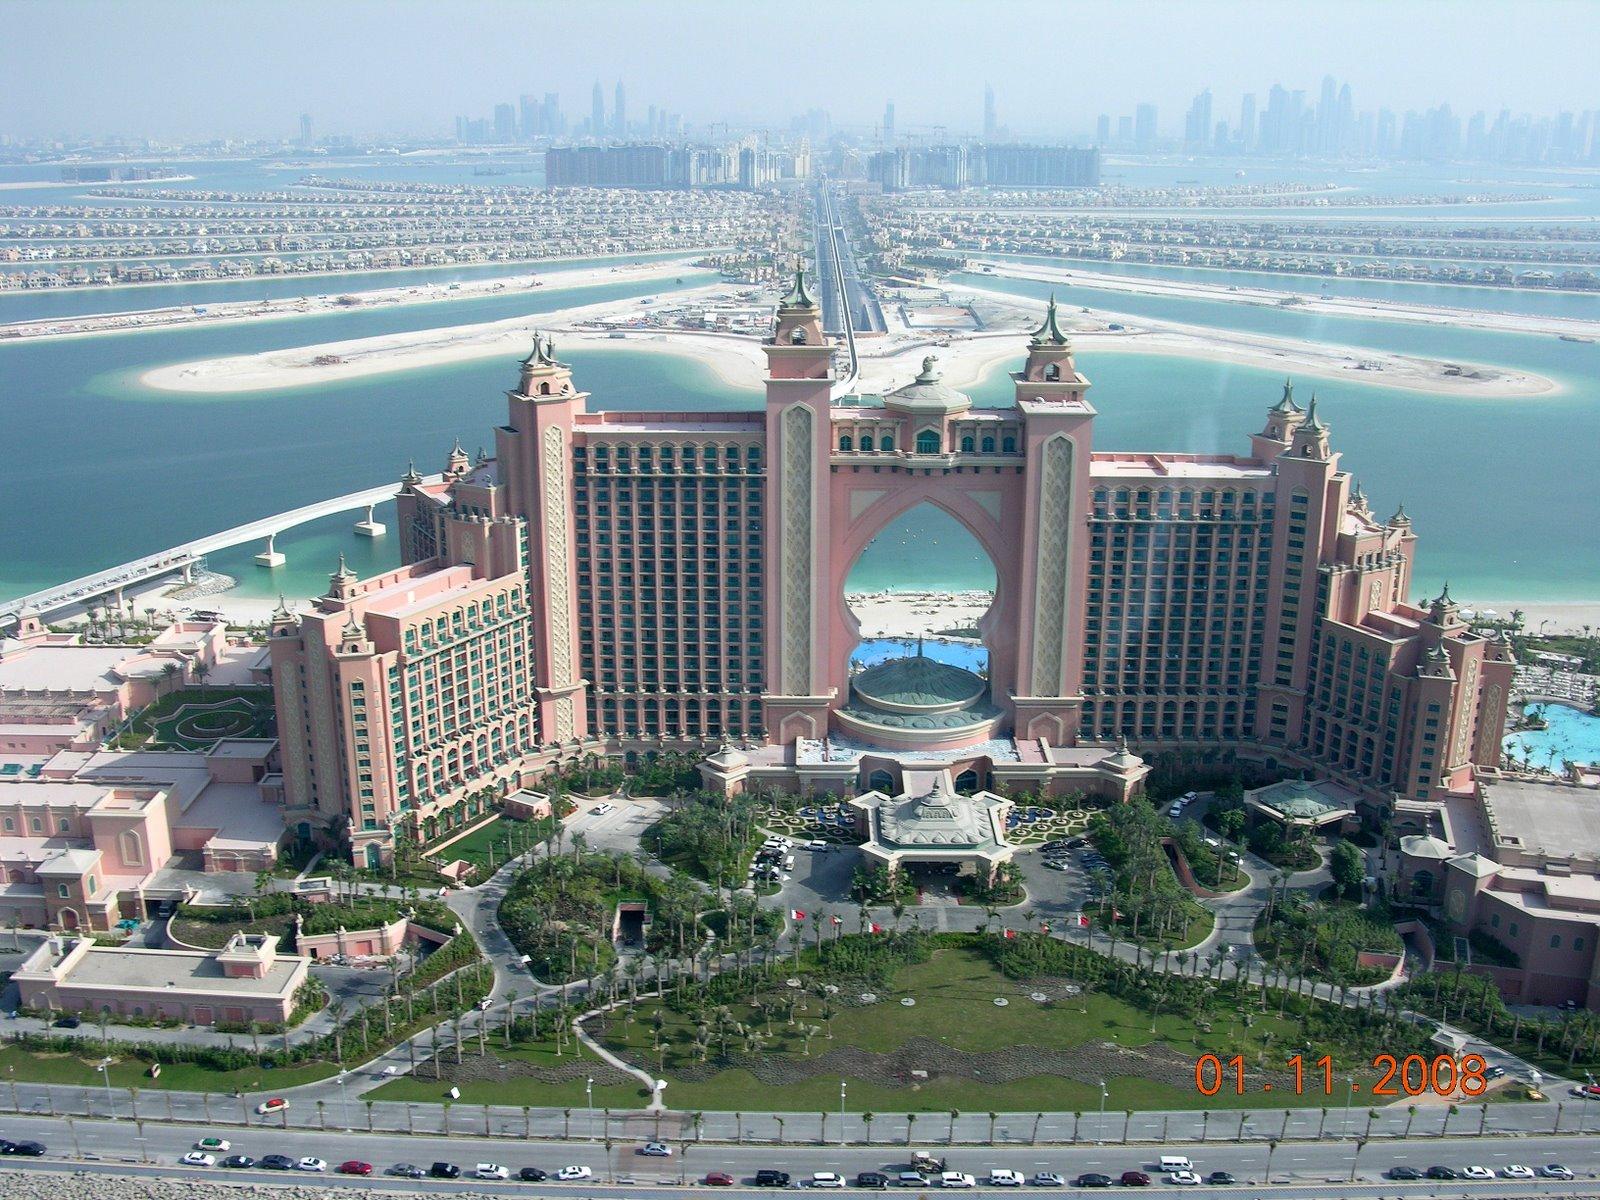 http://4.bp.blogspot.com/-_Nce3gRfKco/Tk567-hjmxI/AAAAAAAAAoA/7E7K_mlCP2o/s1600/superel-Dubai.jpg